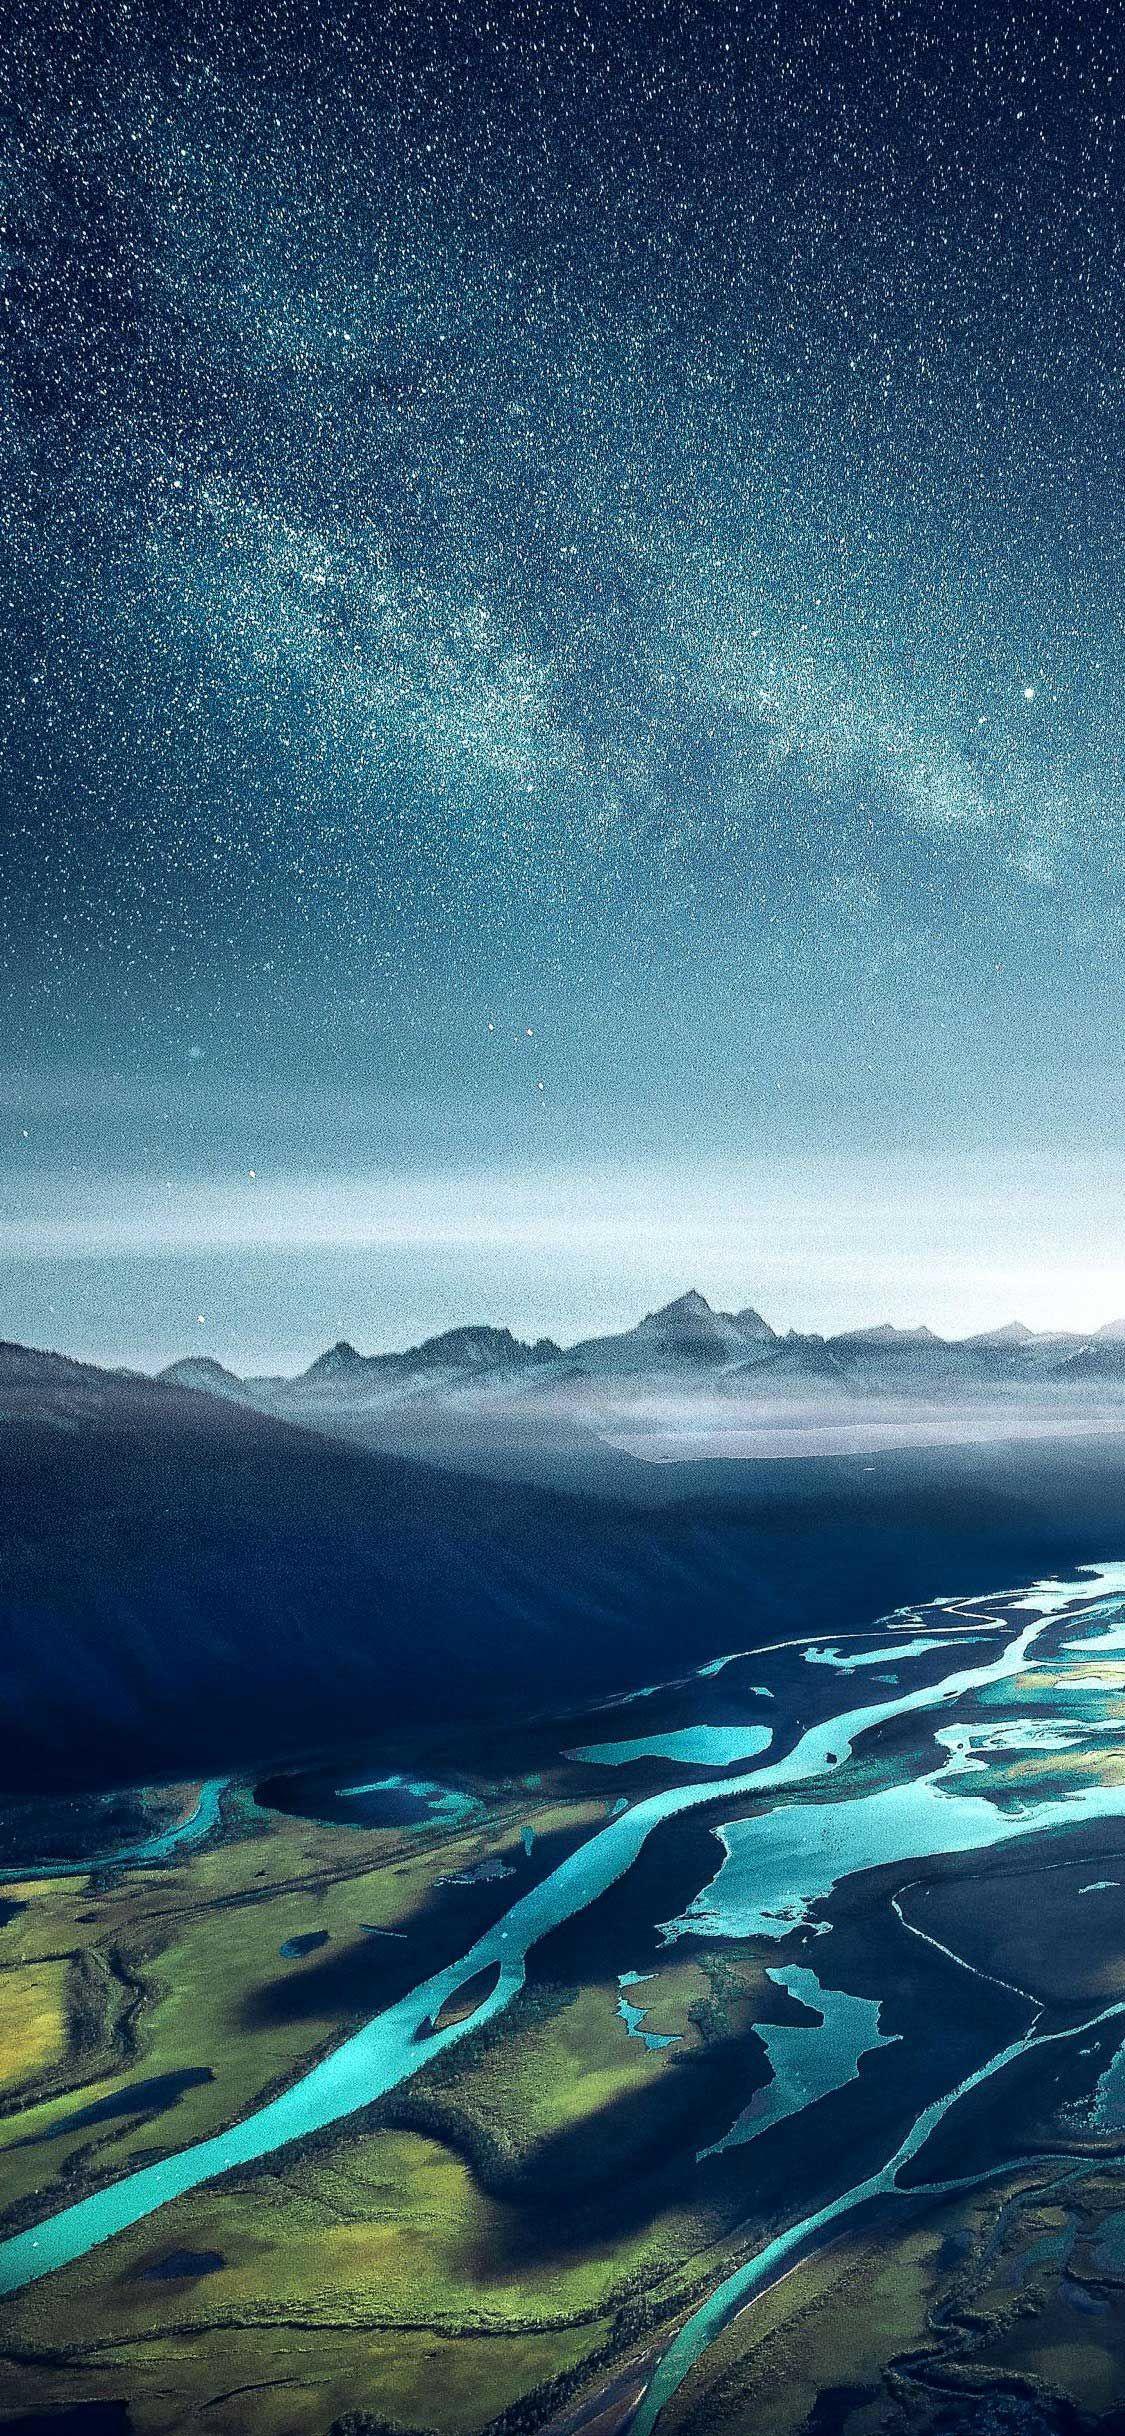 Iphone X Wallpaper Starry sky mountain range river